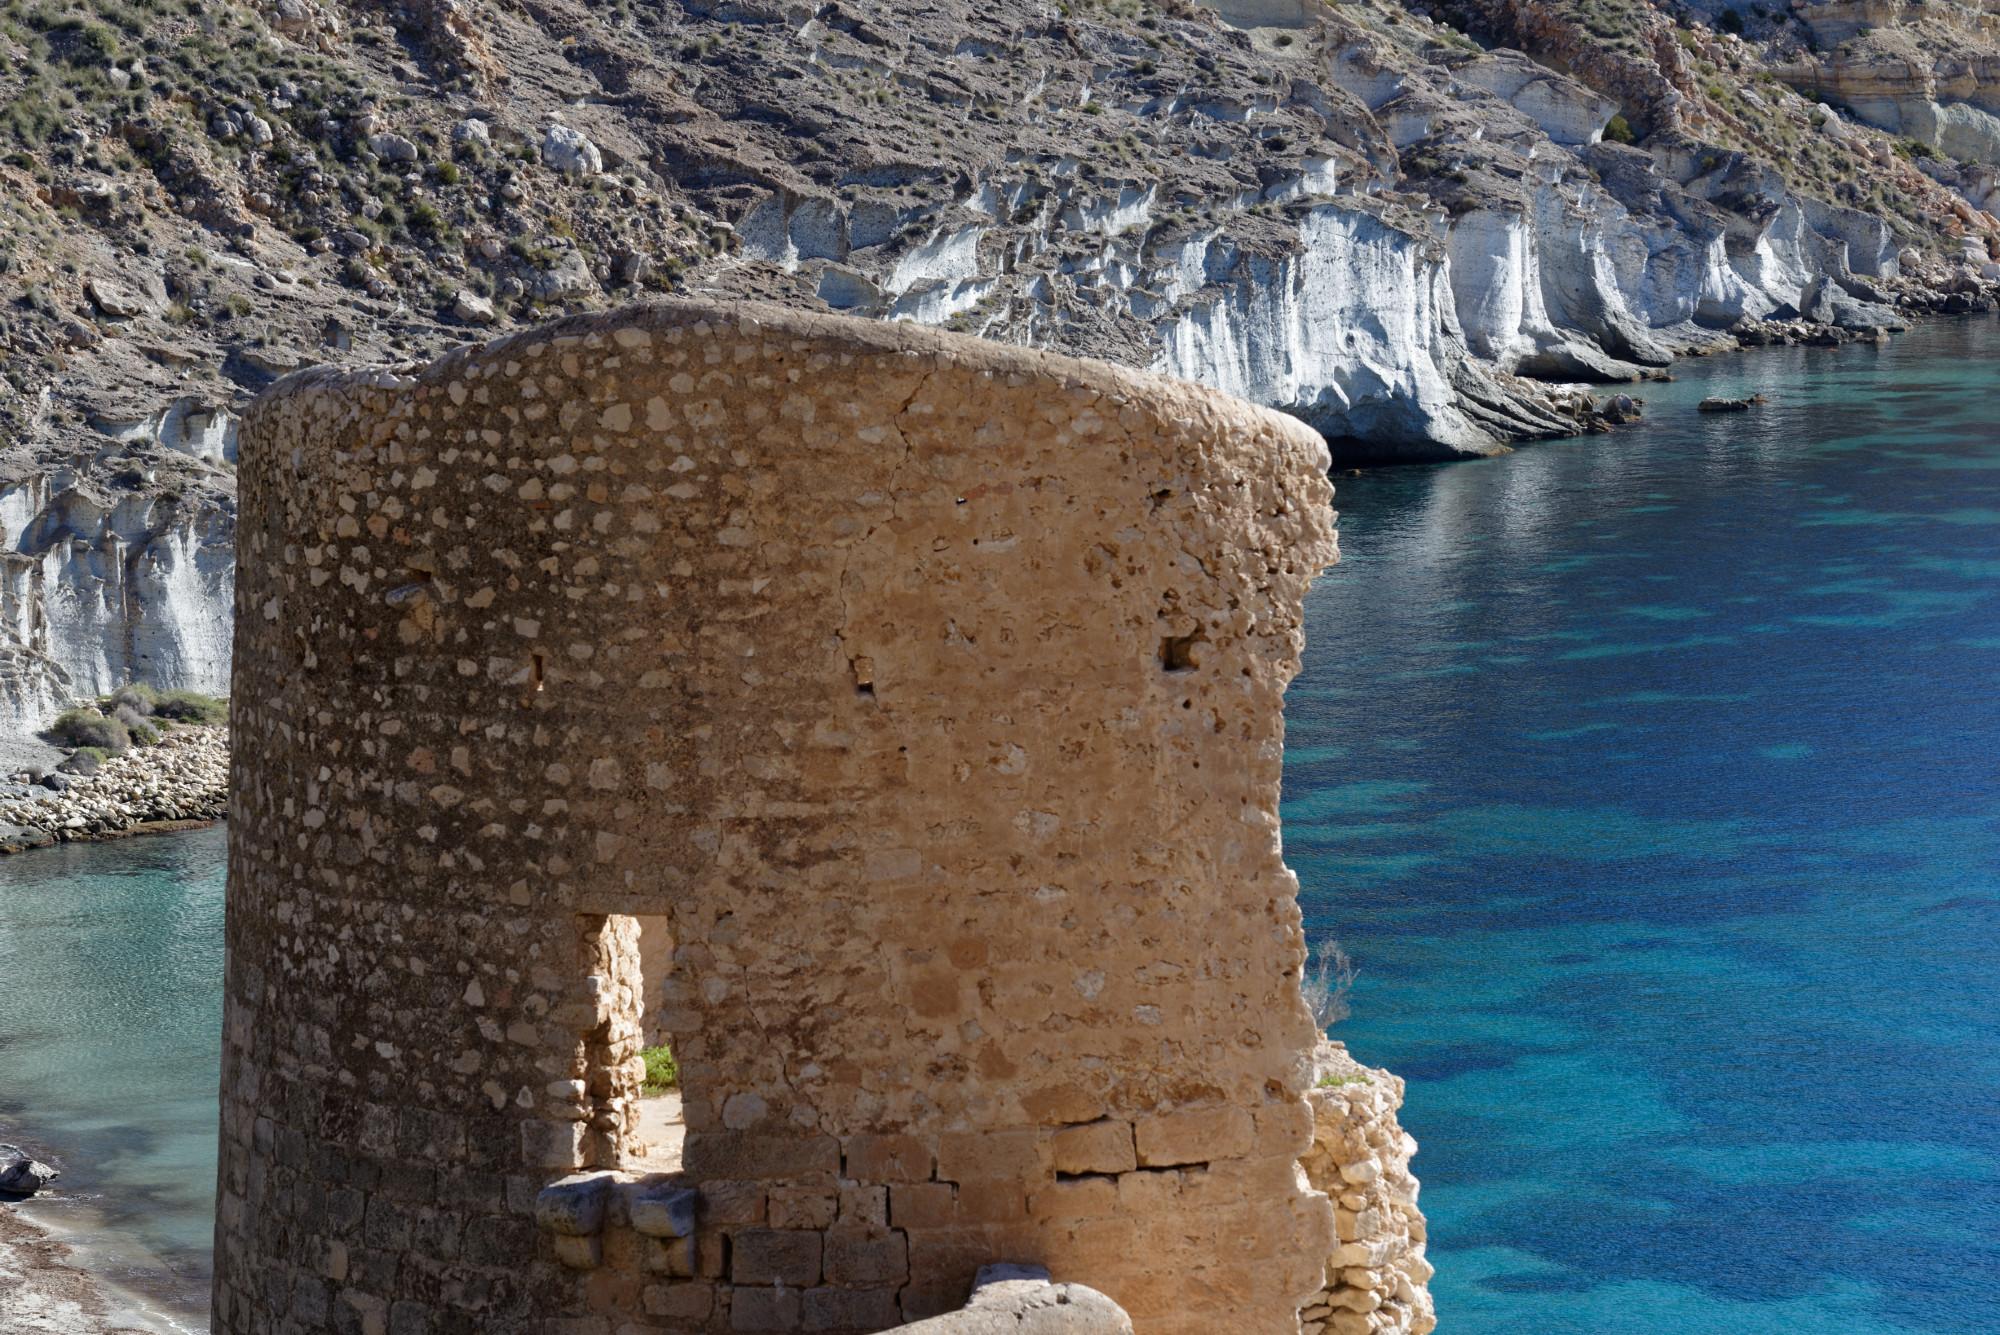 171213-Marche Las Negras-Cala San Pedro-Las Negras (47) (Cabo de Gata-Andalousie)